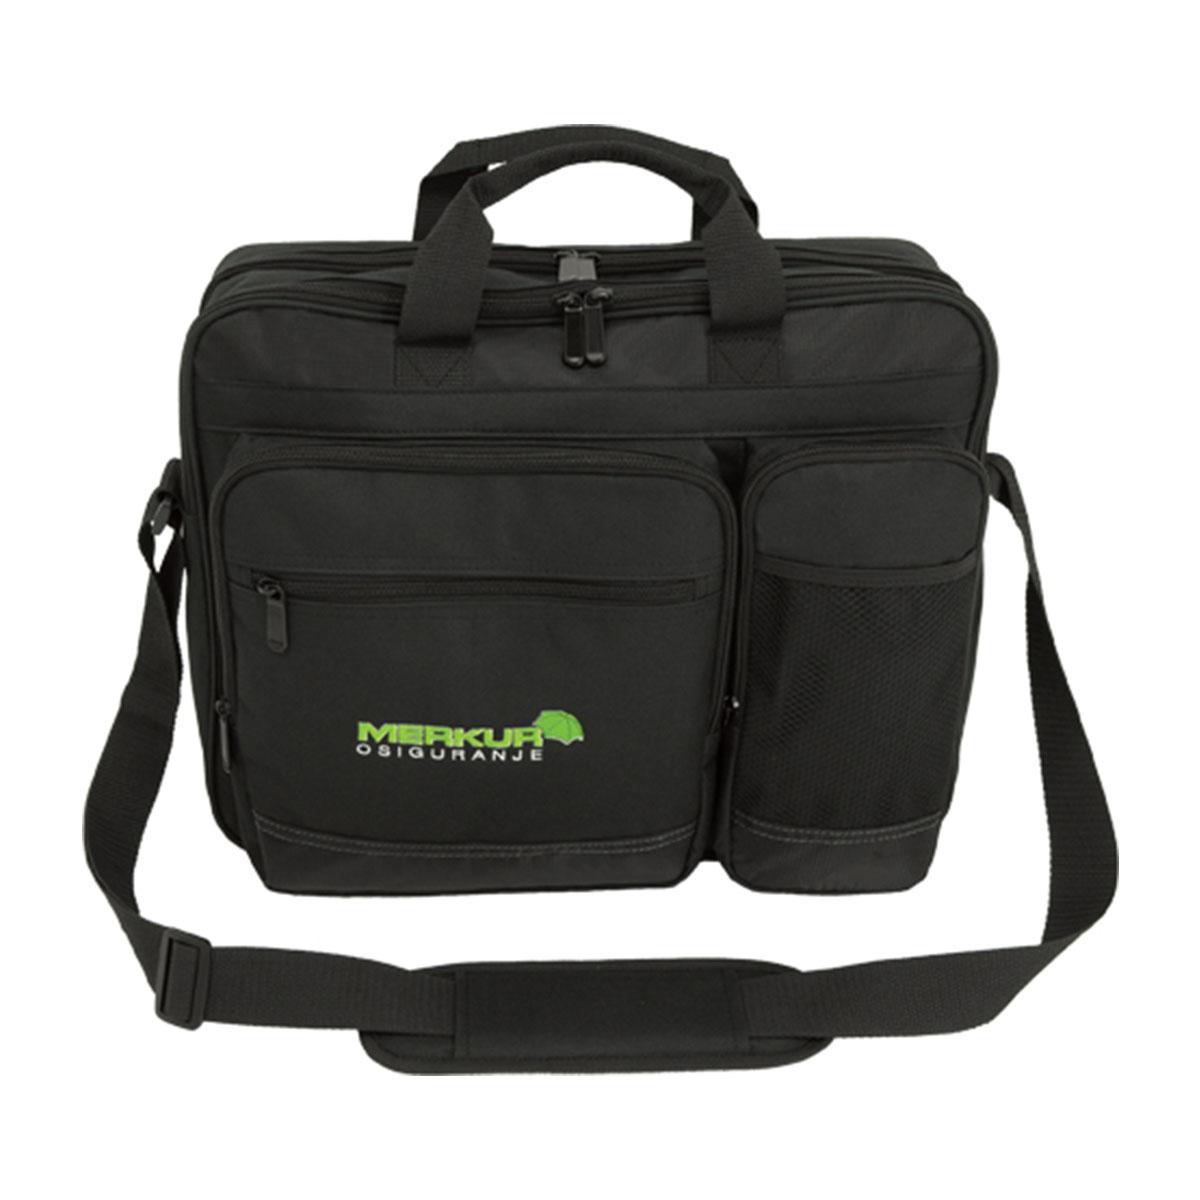 Nemesis Conference Bag-Black